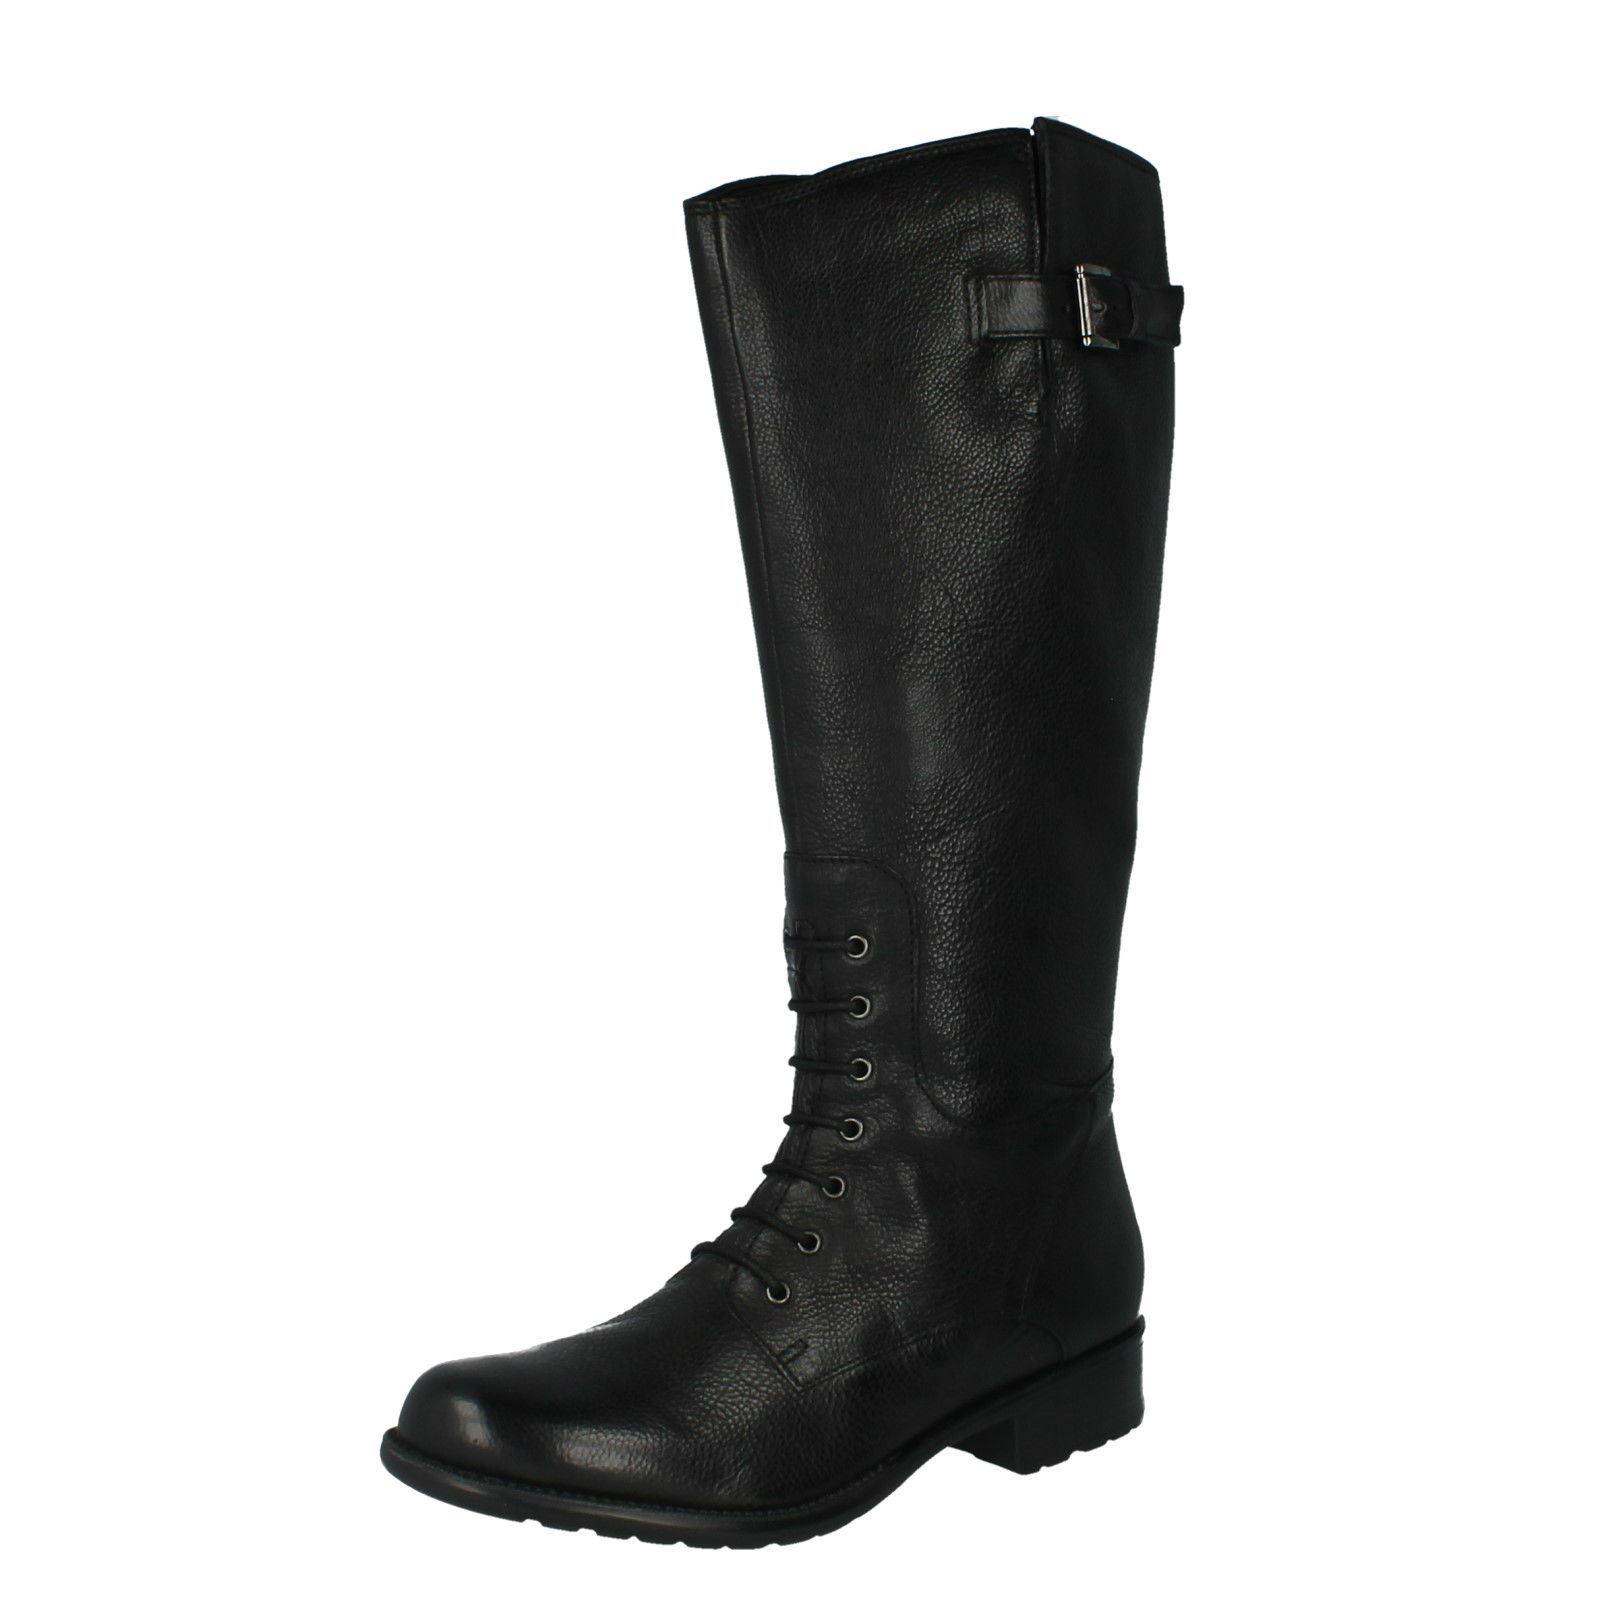 Mullin Ladies Length Clove Knee Up Black Clarks Boots Zip xrqfwIY7r